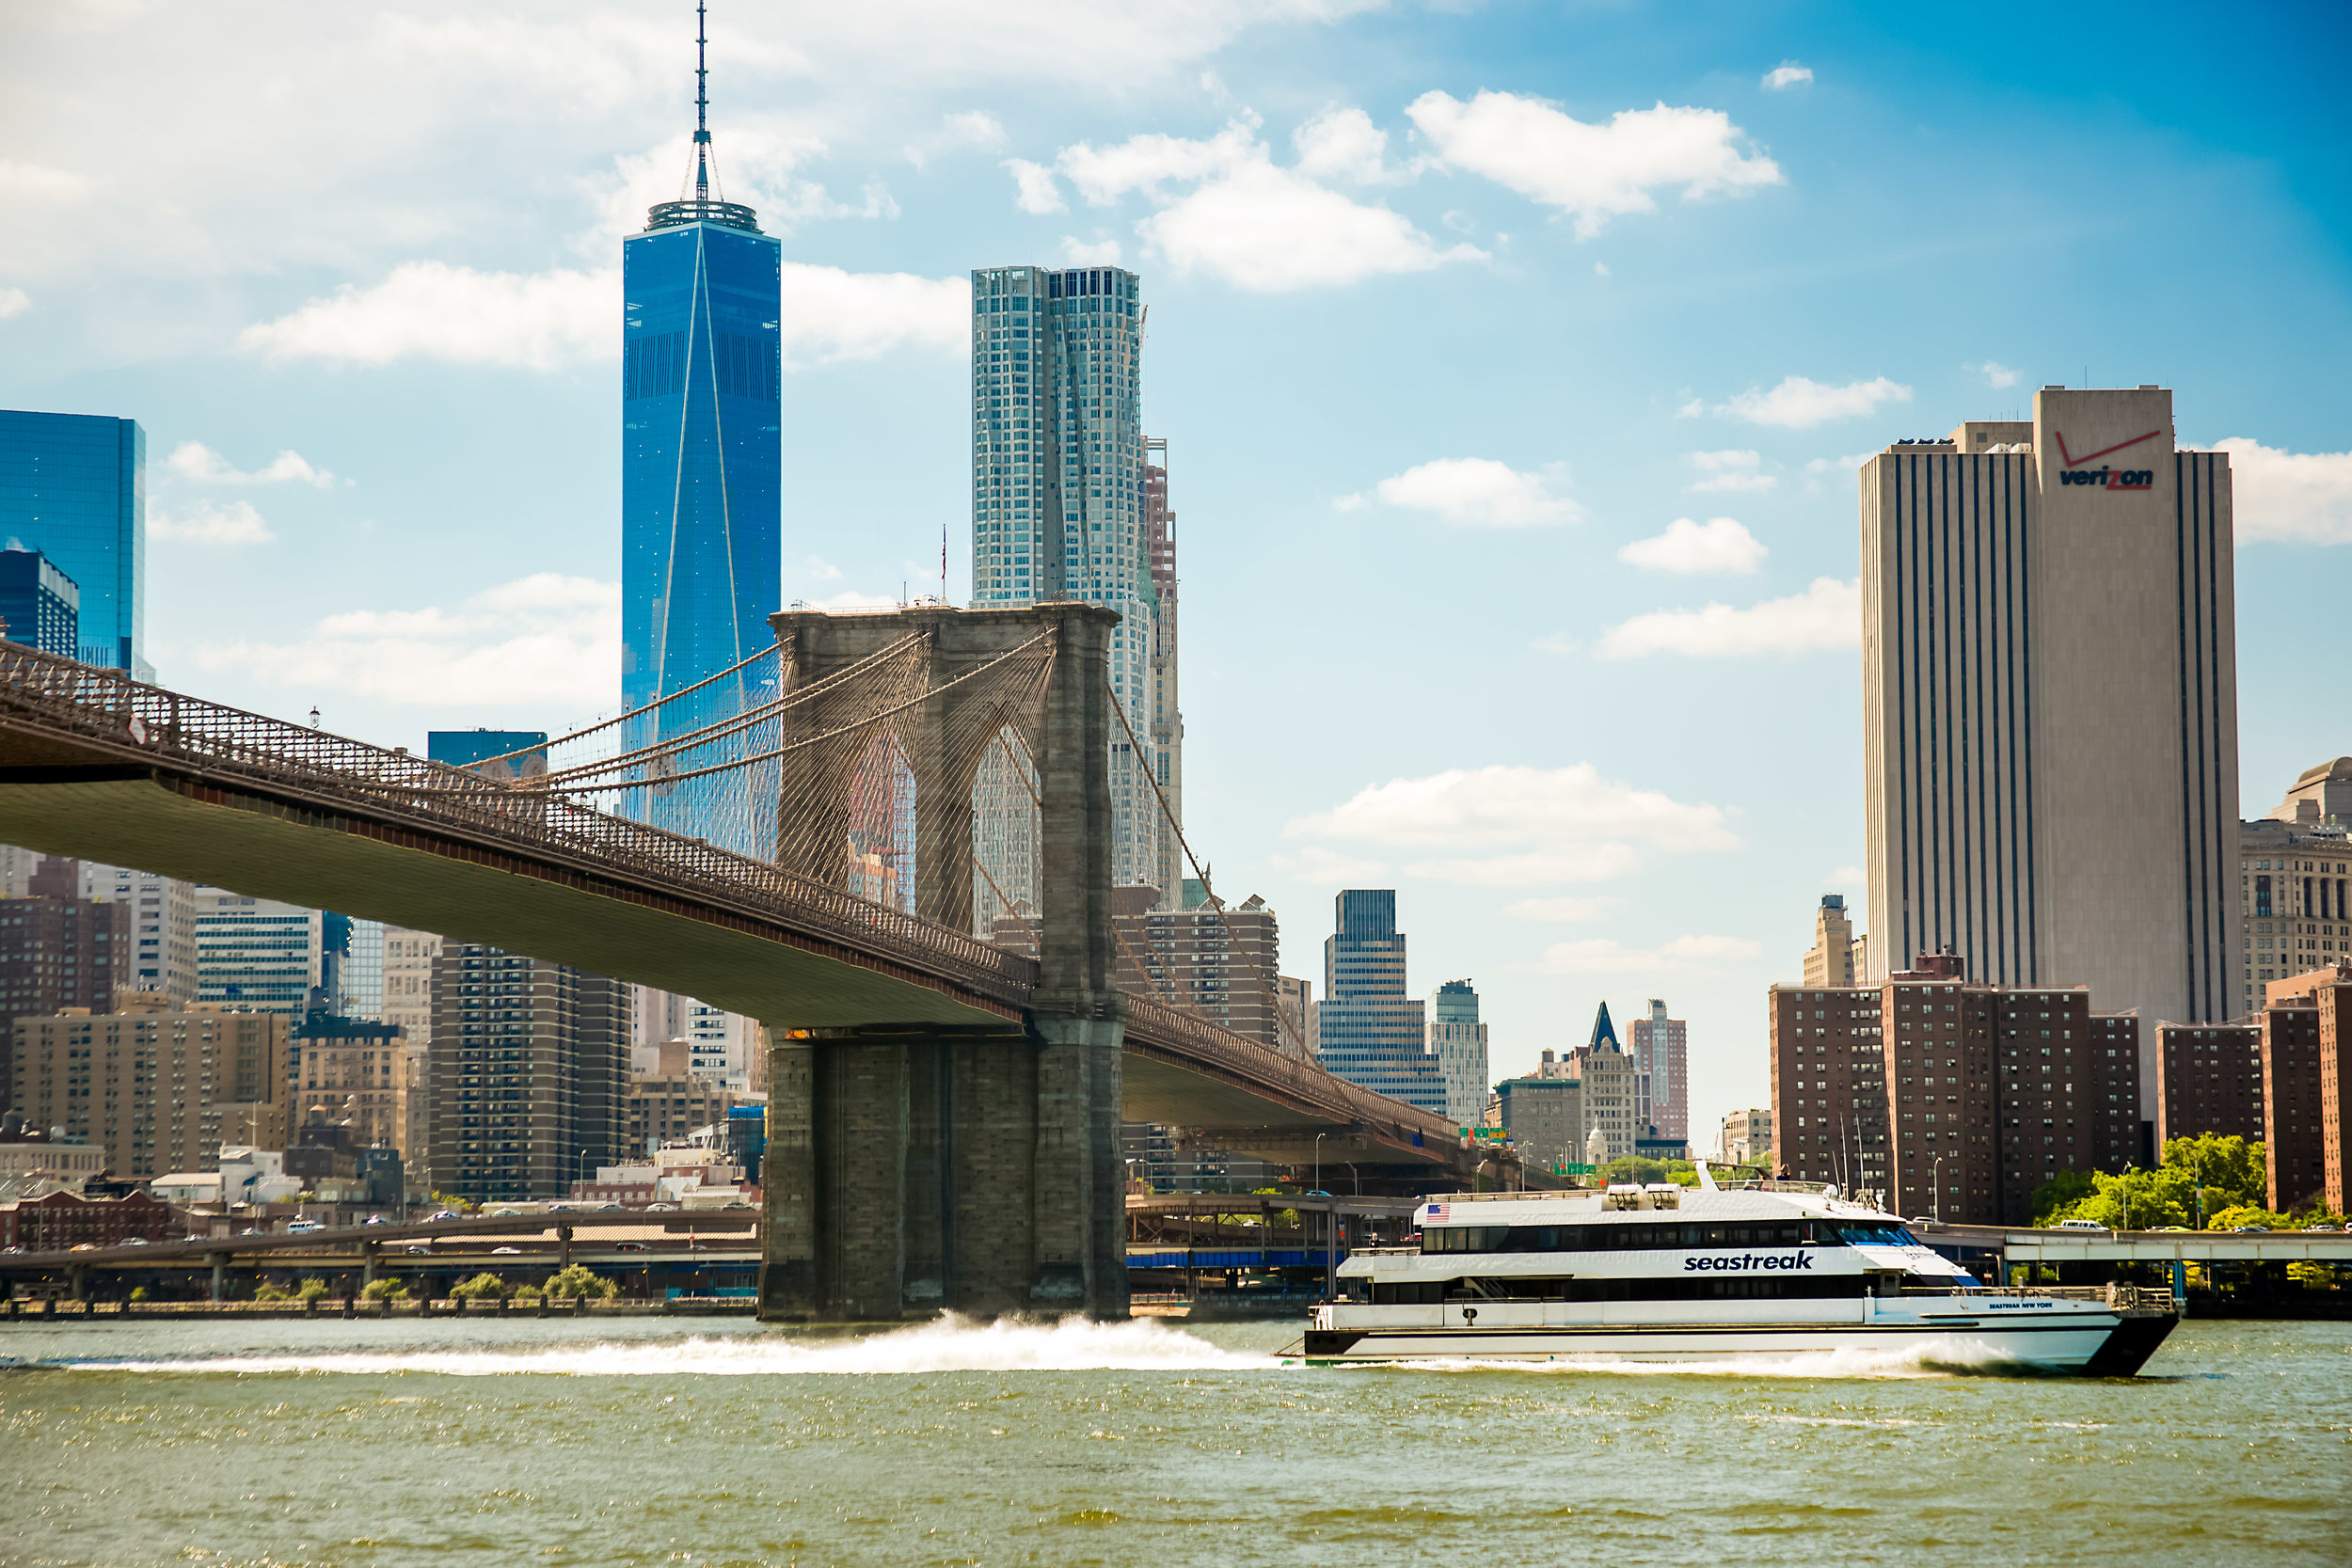 LSNY_Brooklyn_Bridge_Park-2.jpg